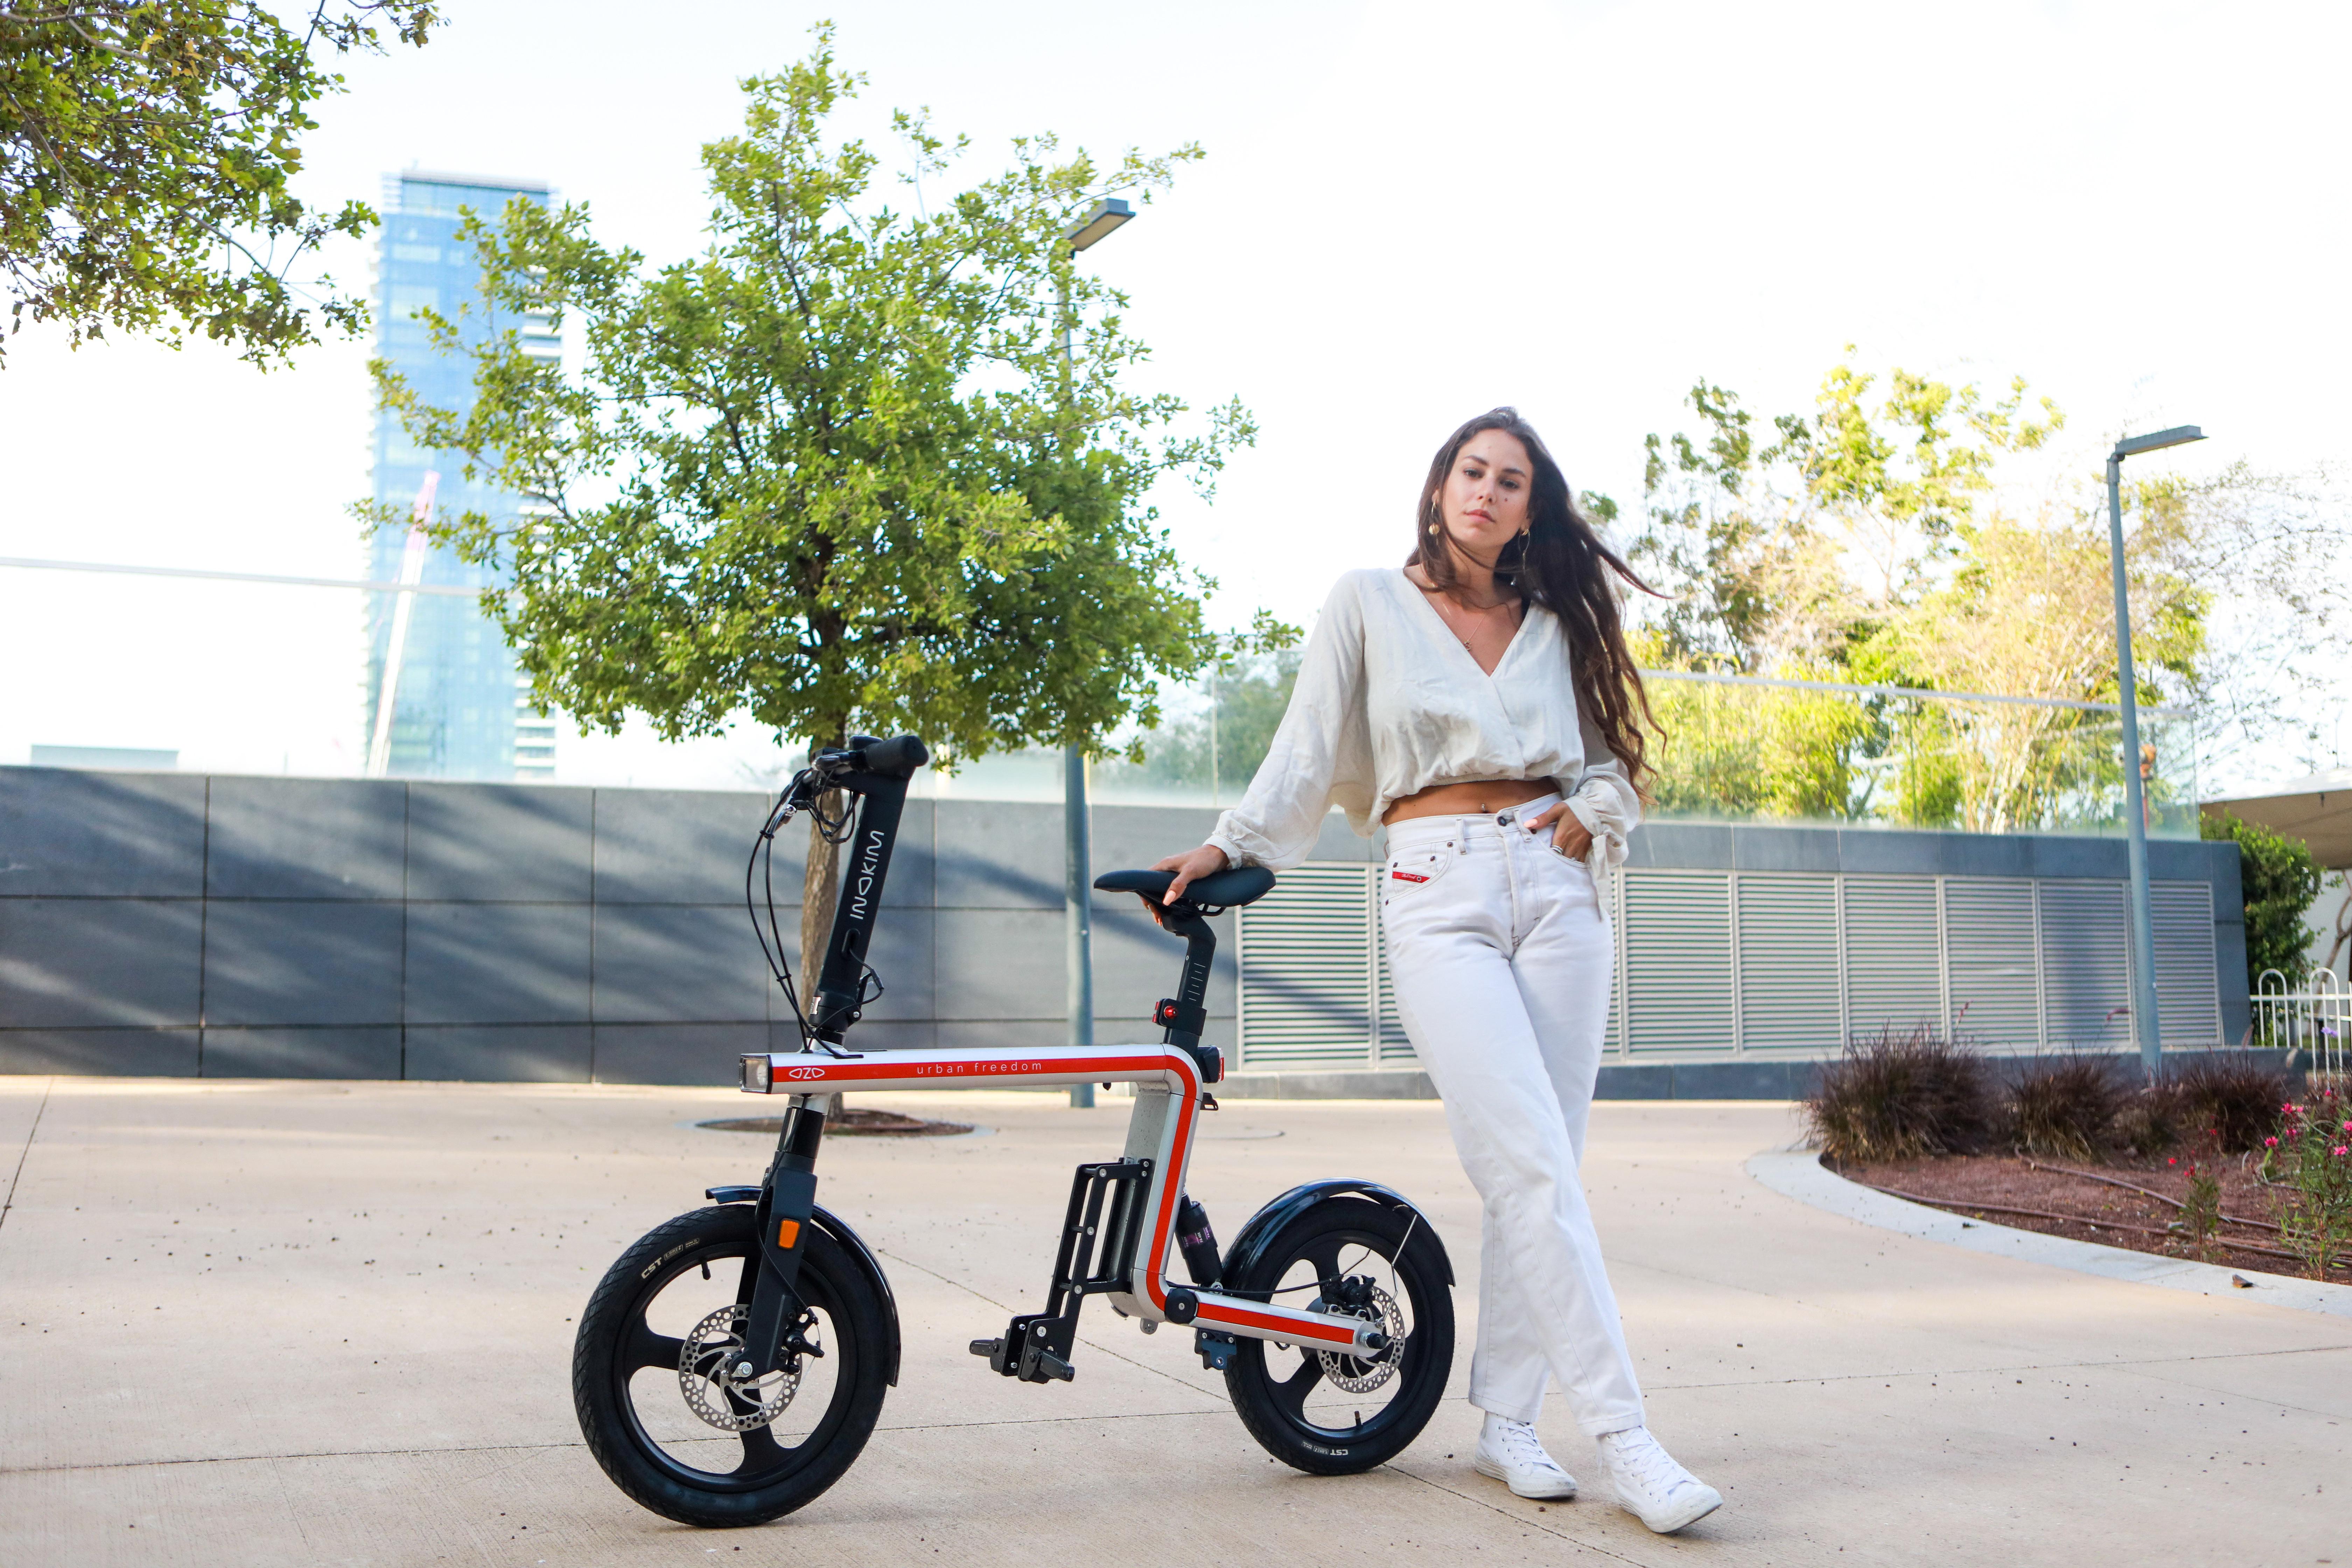 INOKIM OZO E Bike (OZOa & OZOe) First Look at the Revolutionary Ebike by Inokim